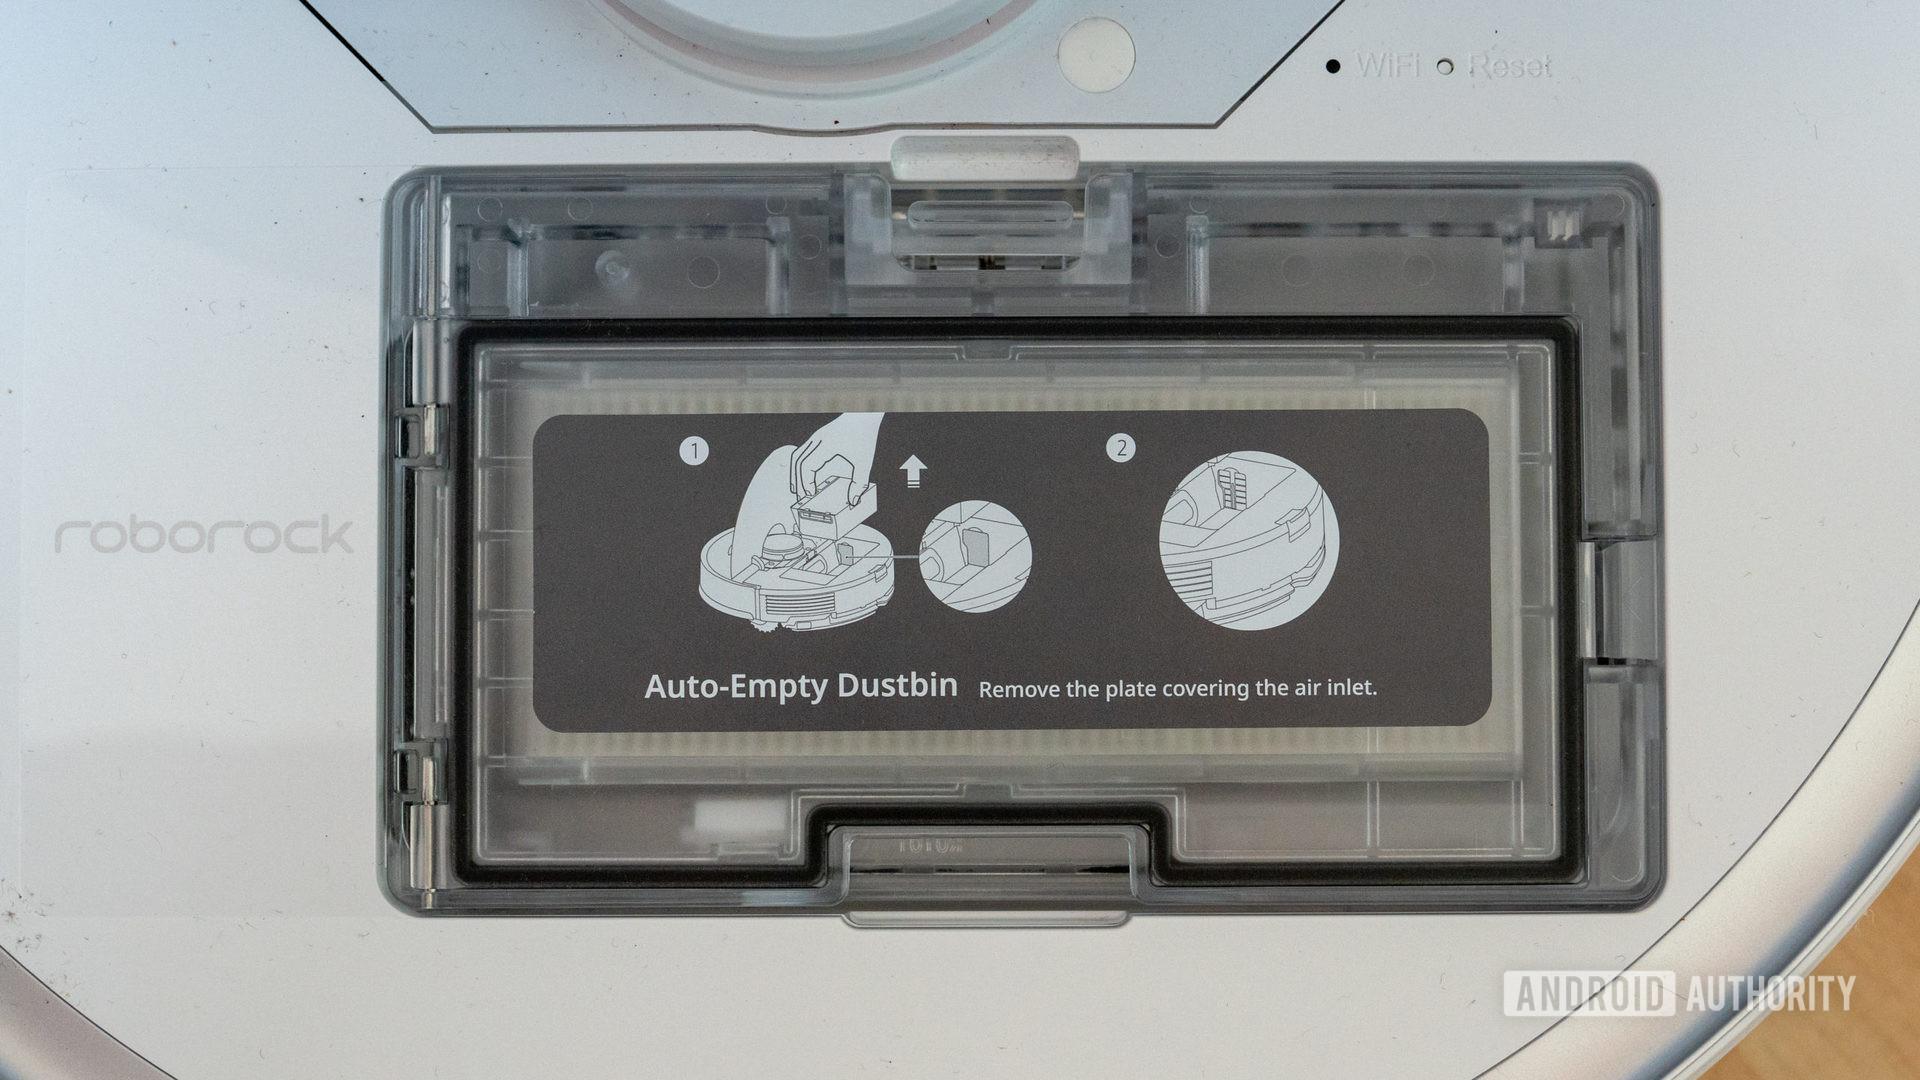 Roborock S7 with auto empty dustbin installed